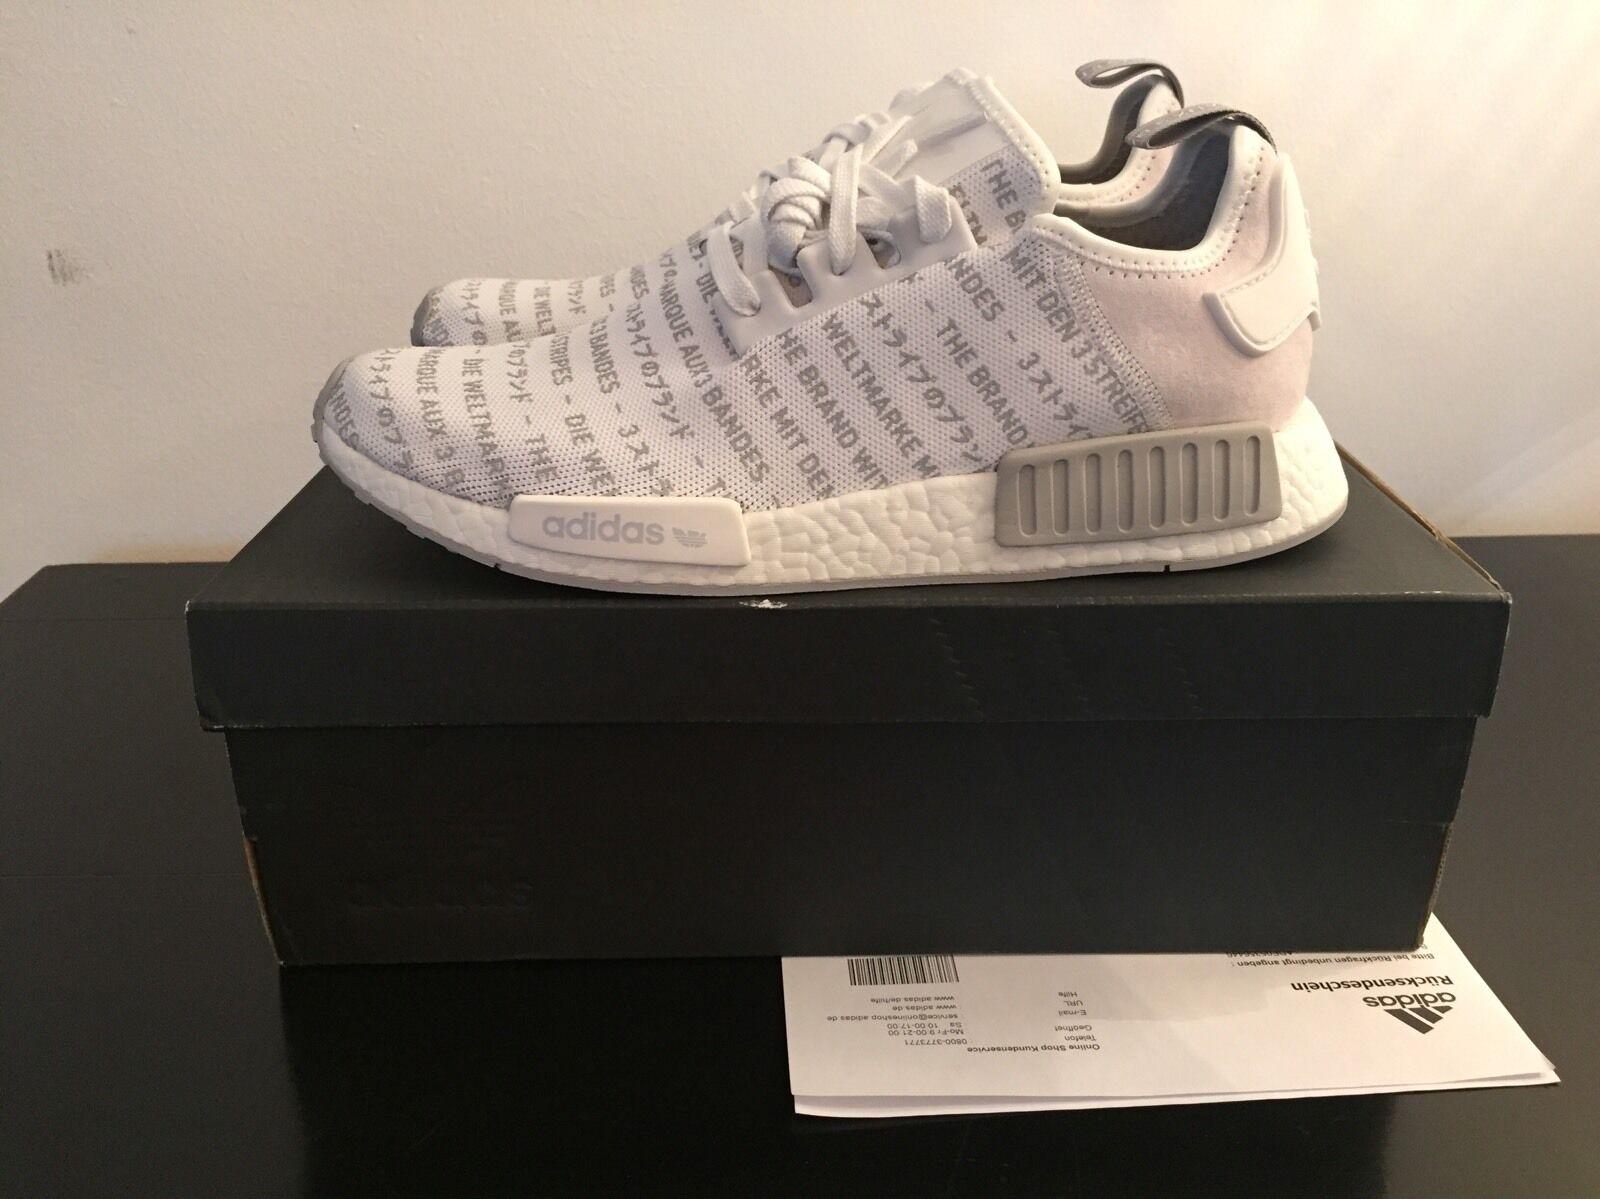 Adidas Originals NMD R1 Japan Weiß in US 12 EU 46 2/3